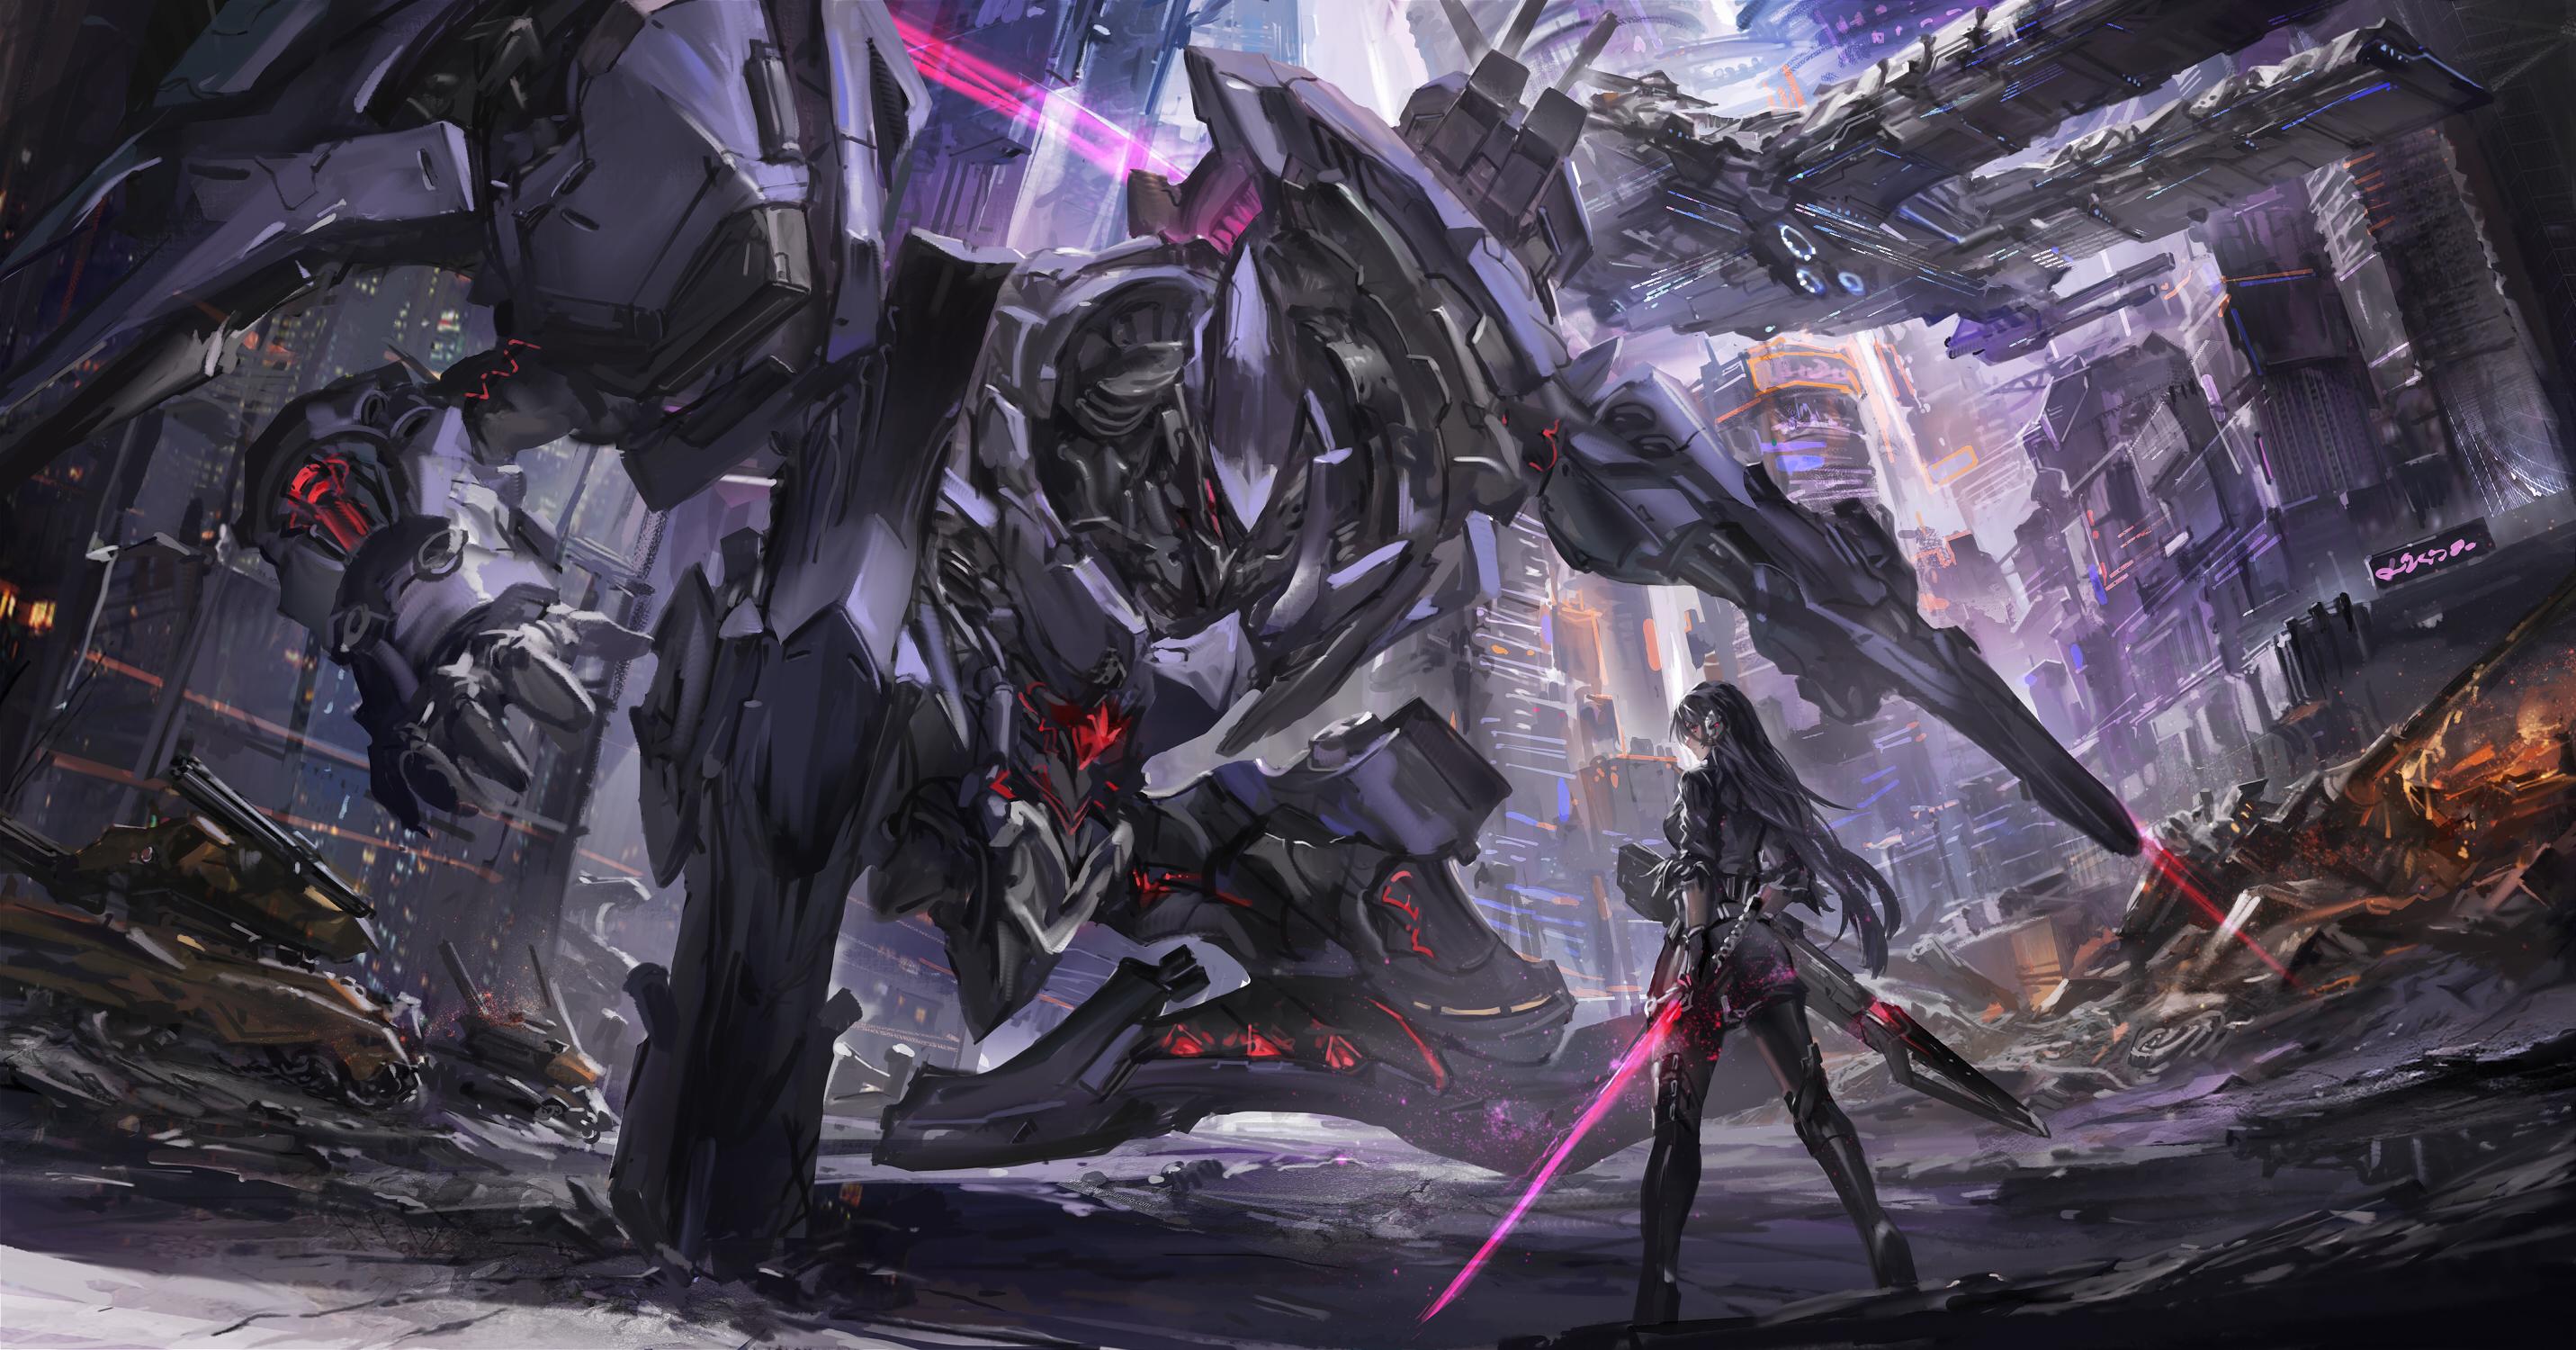 anime war wallpaper - photo #12